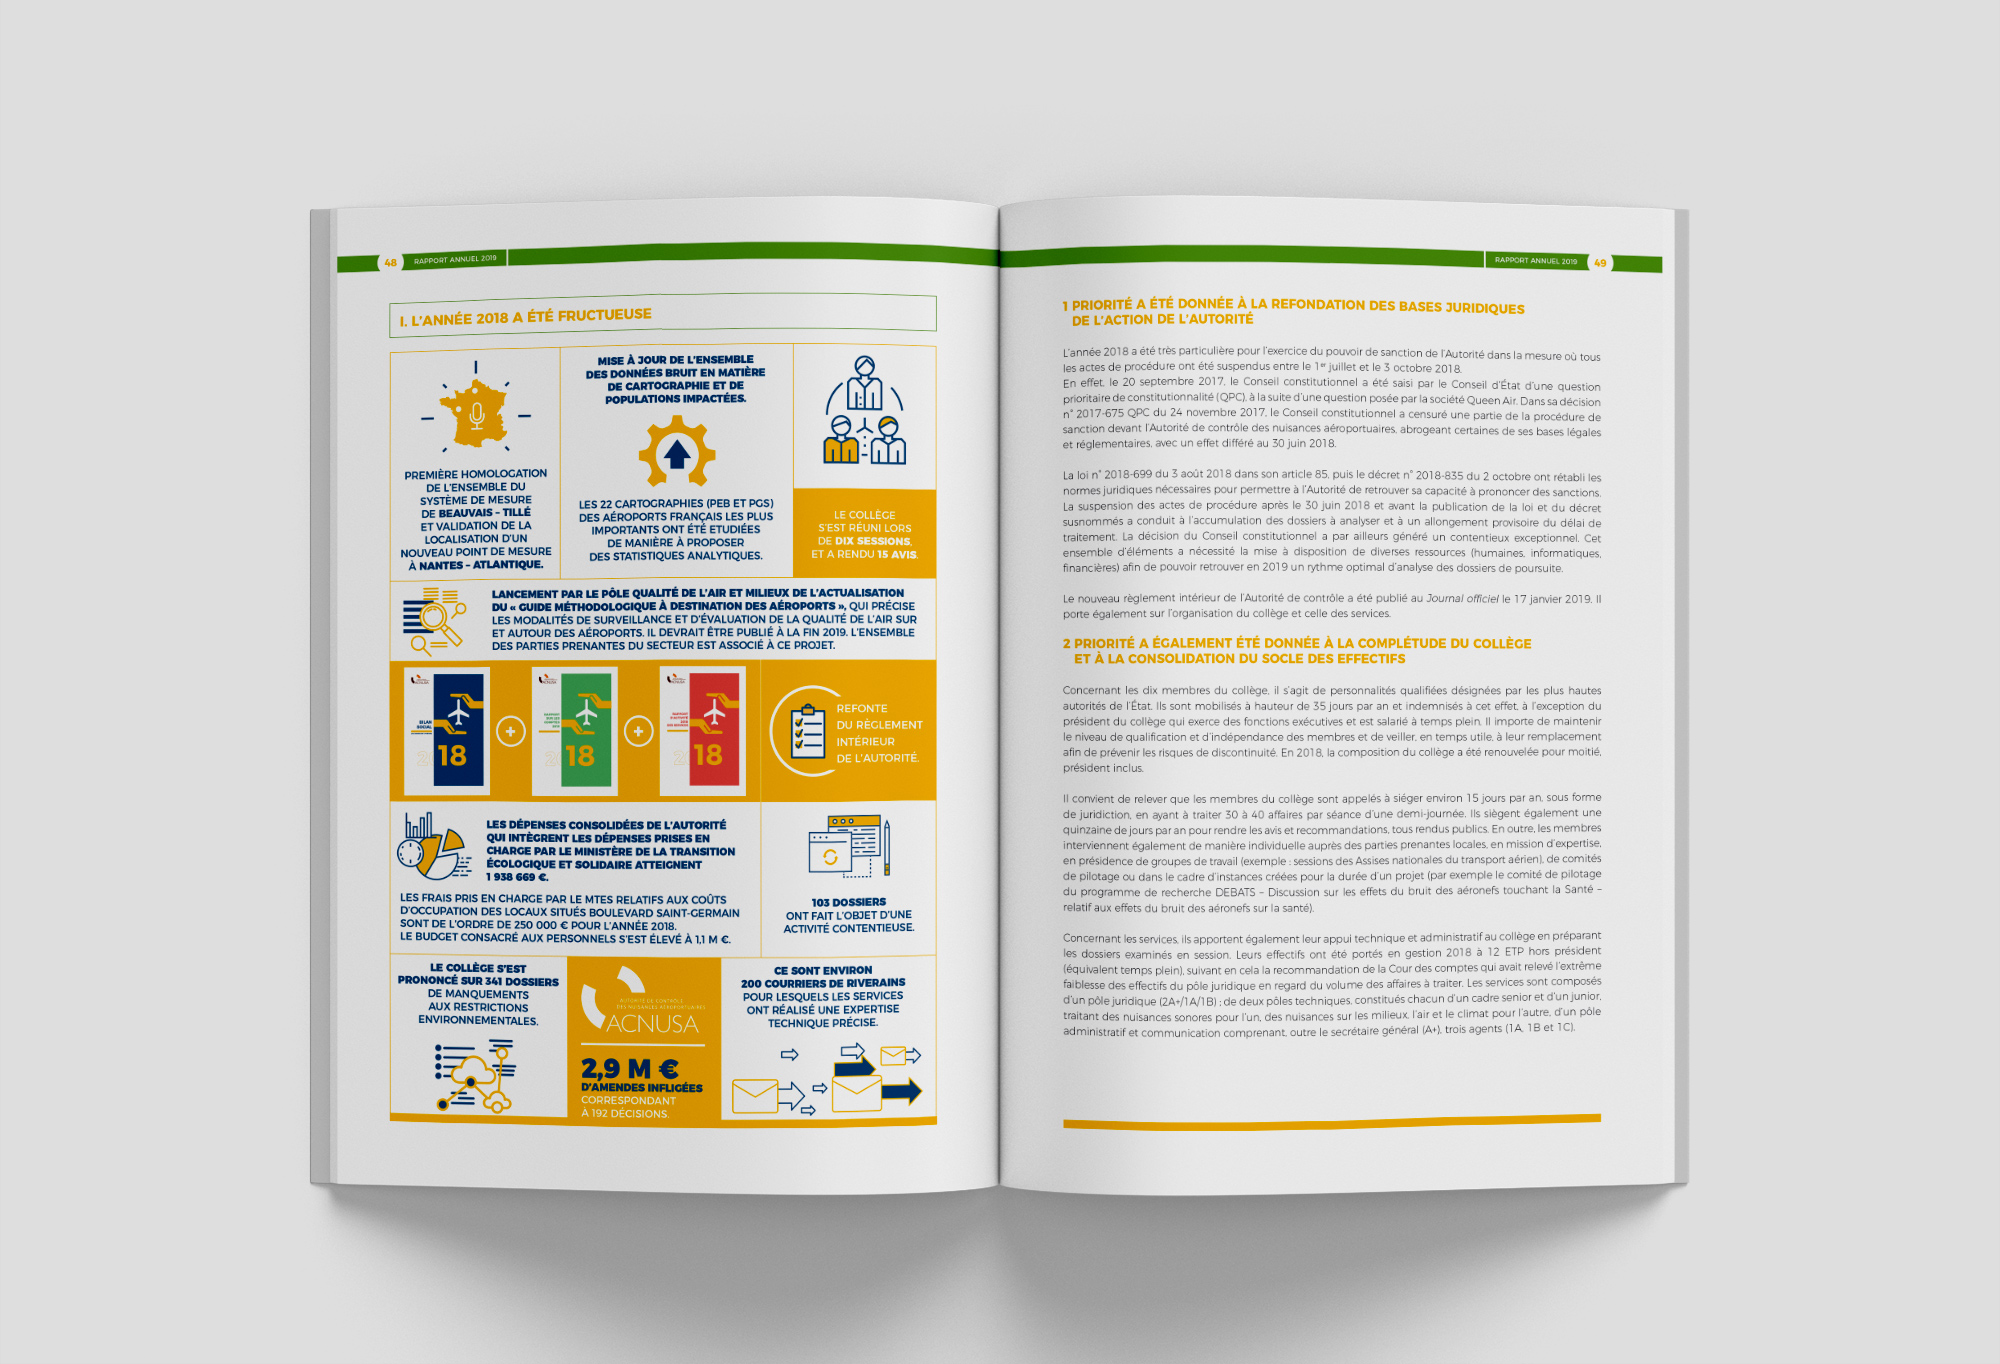 ACNUSA-Rapport-annuel-2019-conception-wala-studio-graphique1